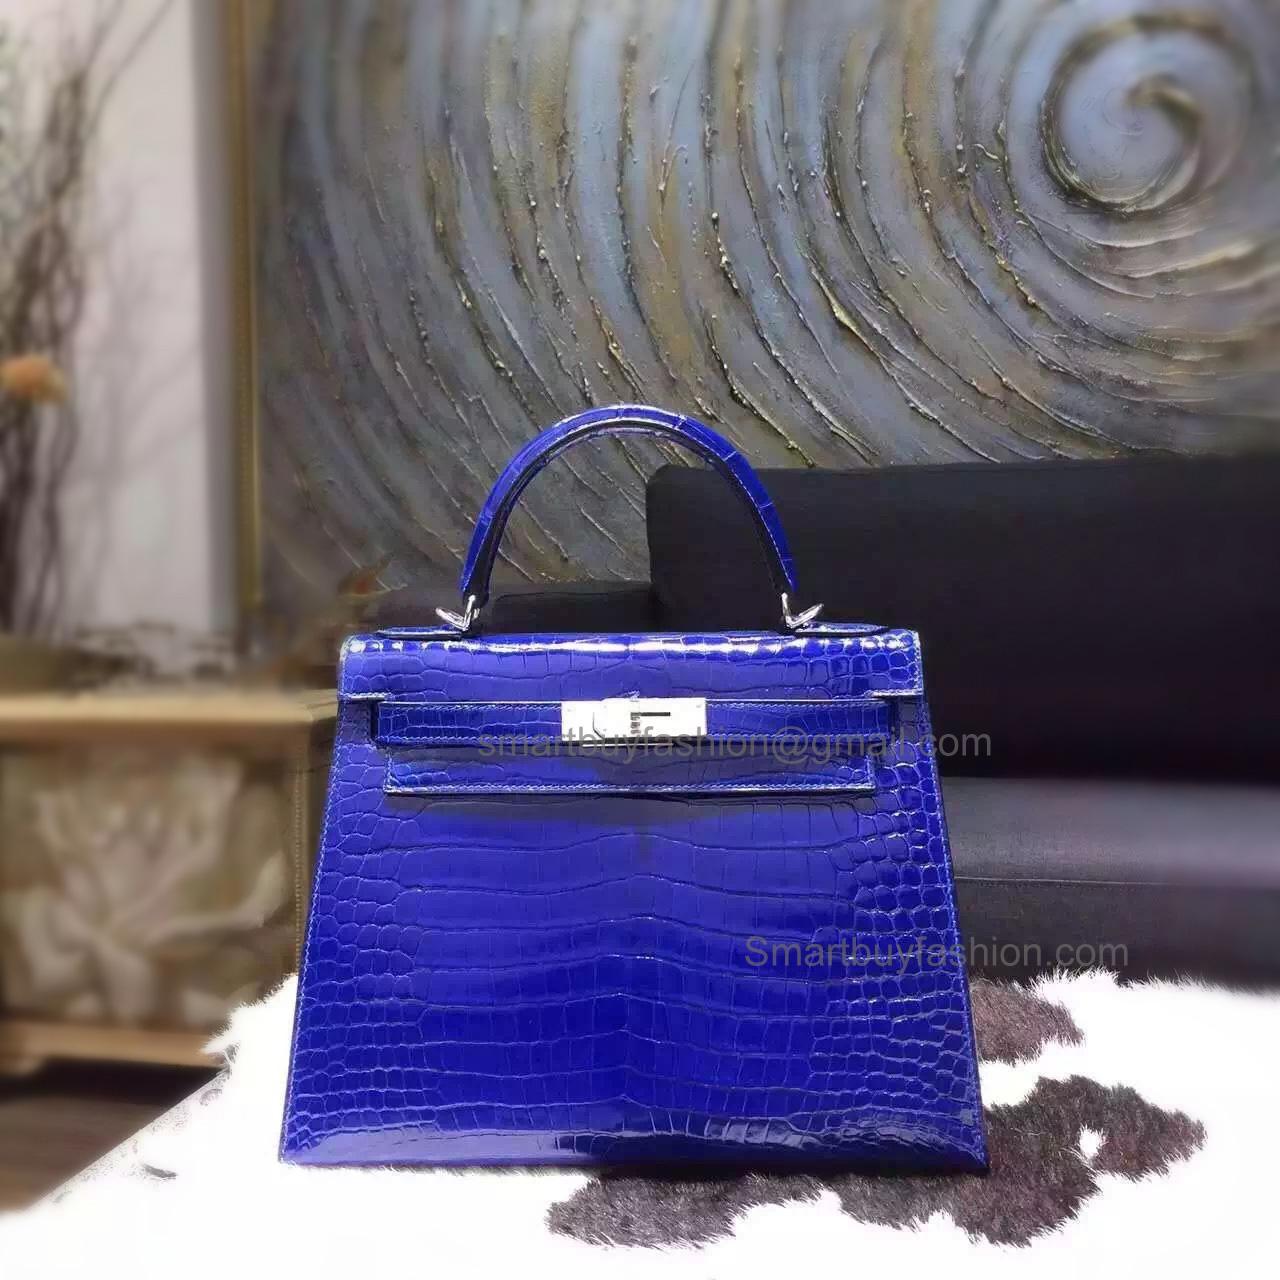 b2d4d7c7e239 Replica Hermes Kelly 28 Bag in 7t Blue Electric Shining Porosus Crocodile  SHW